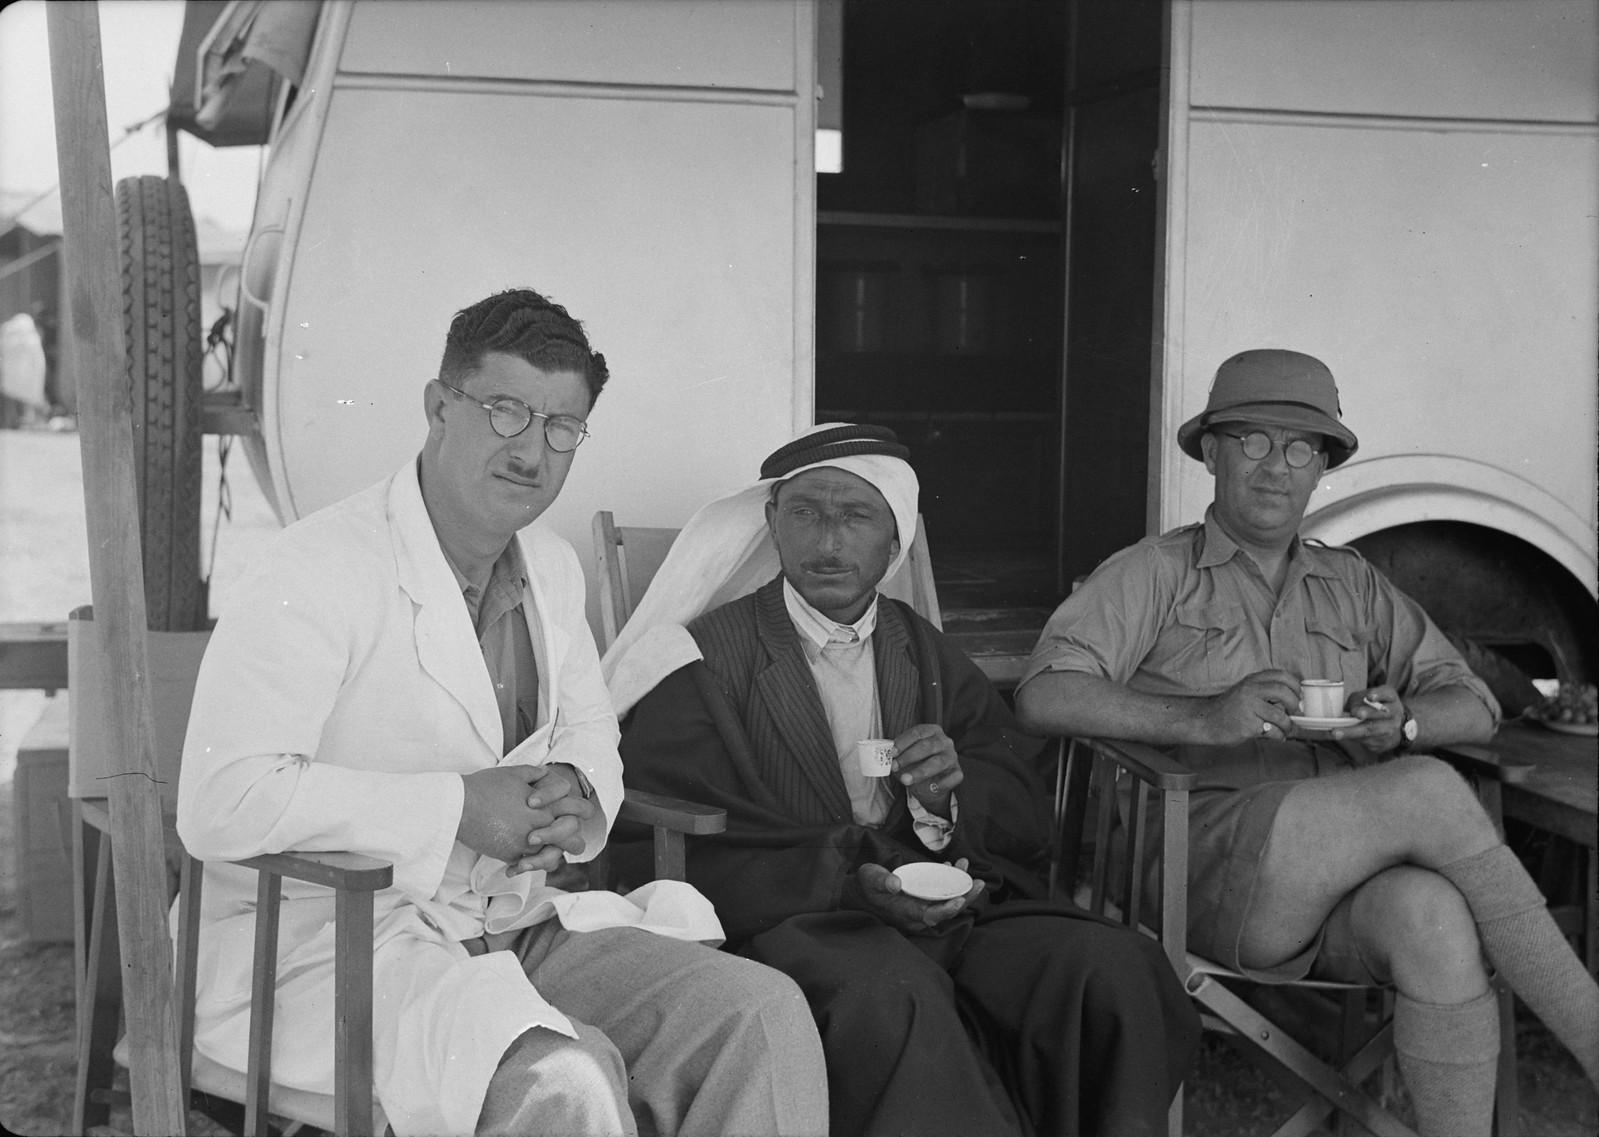 Доктор Шукер, мухтар села Неджд и доктор В.Л. Фергюсон пьют кофе в тени фургона